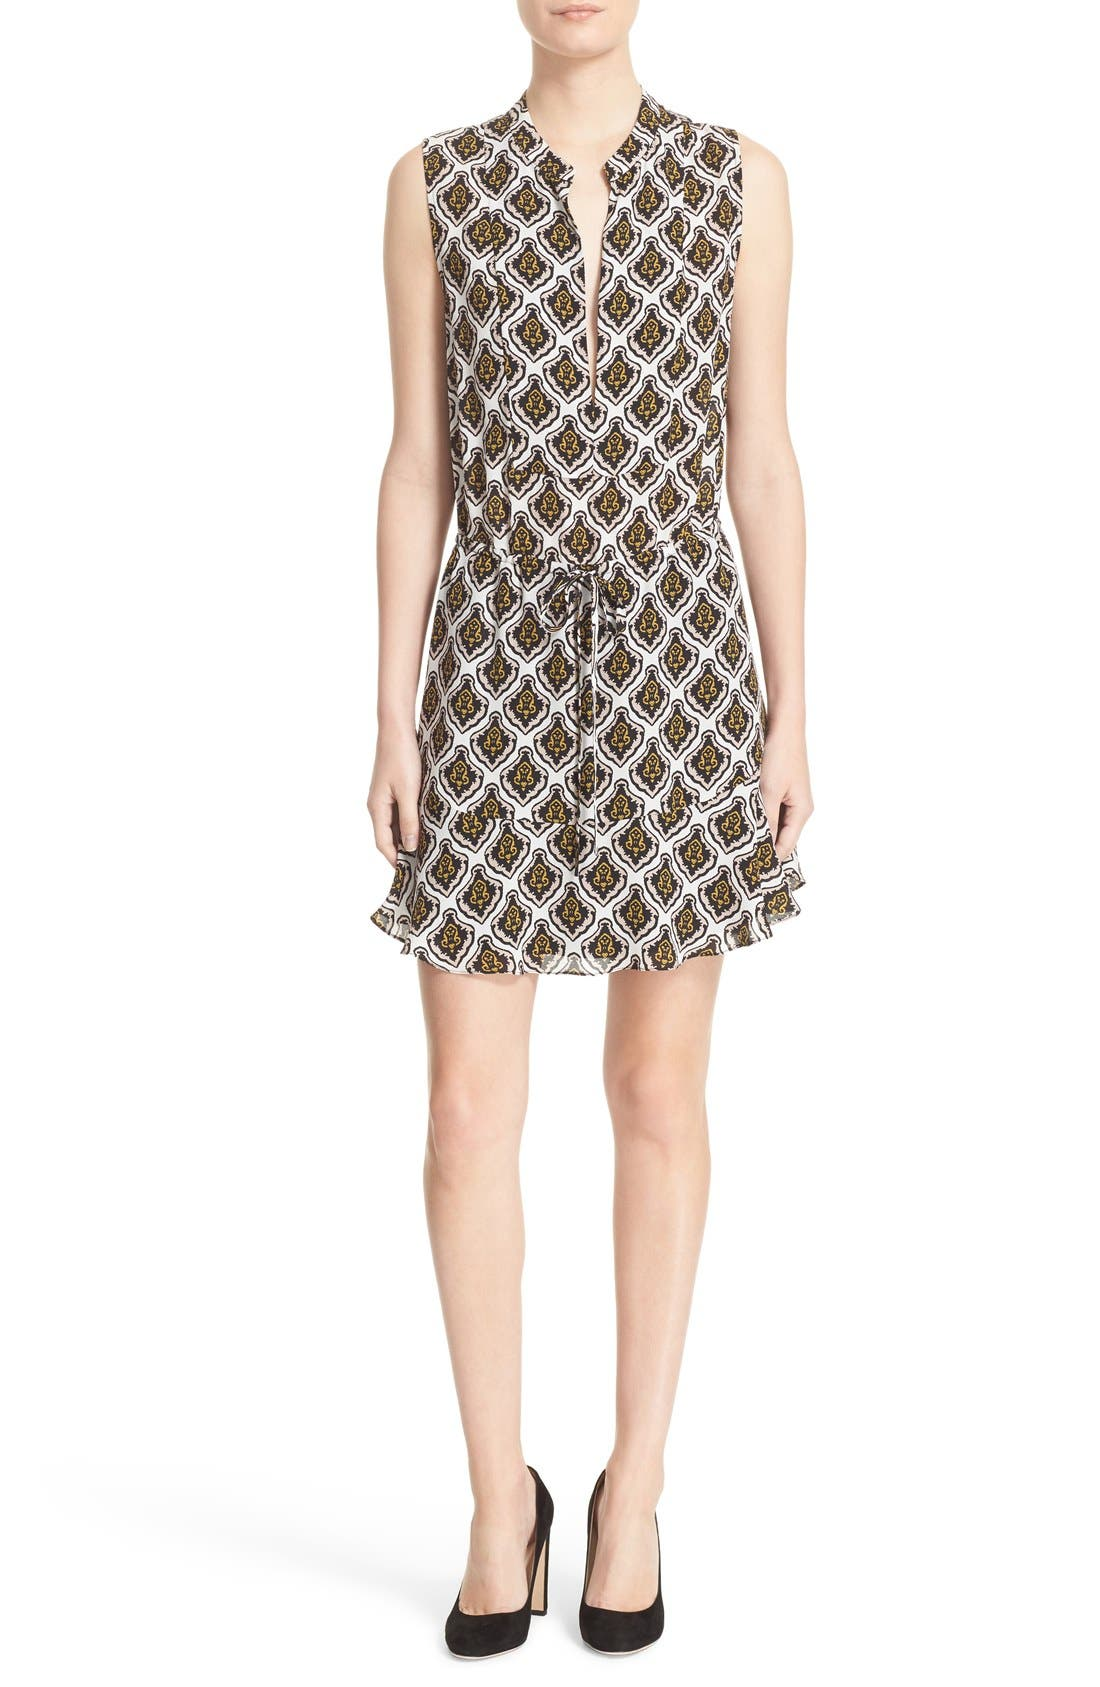 Alternate Image 1 Selected - A.L.C. Calder Print Silk Fit & Flare Dress